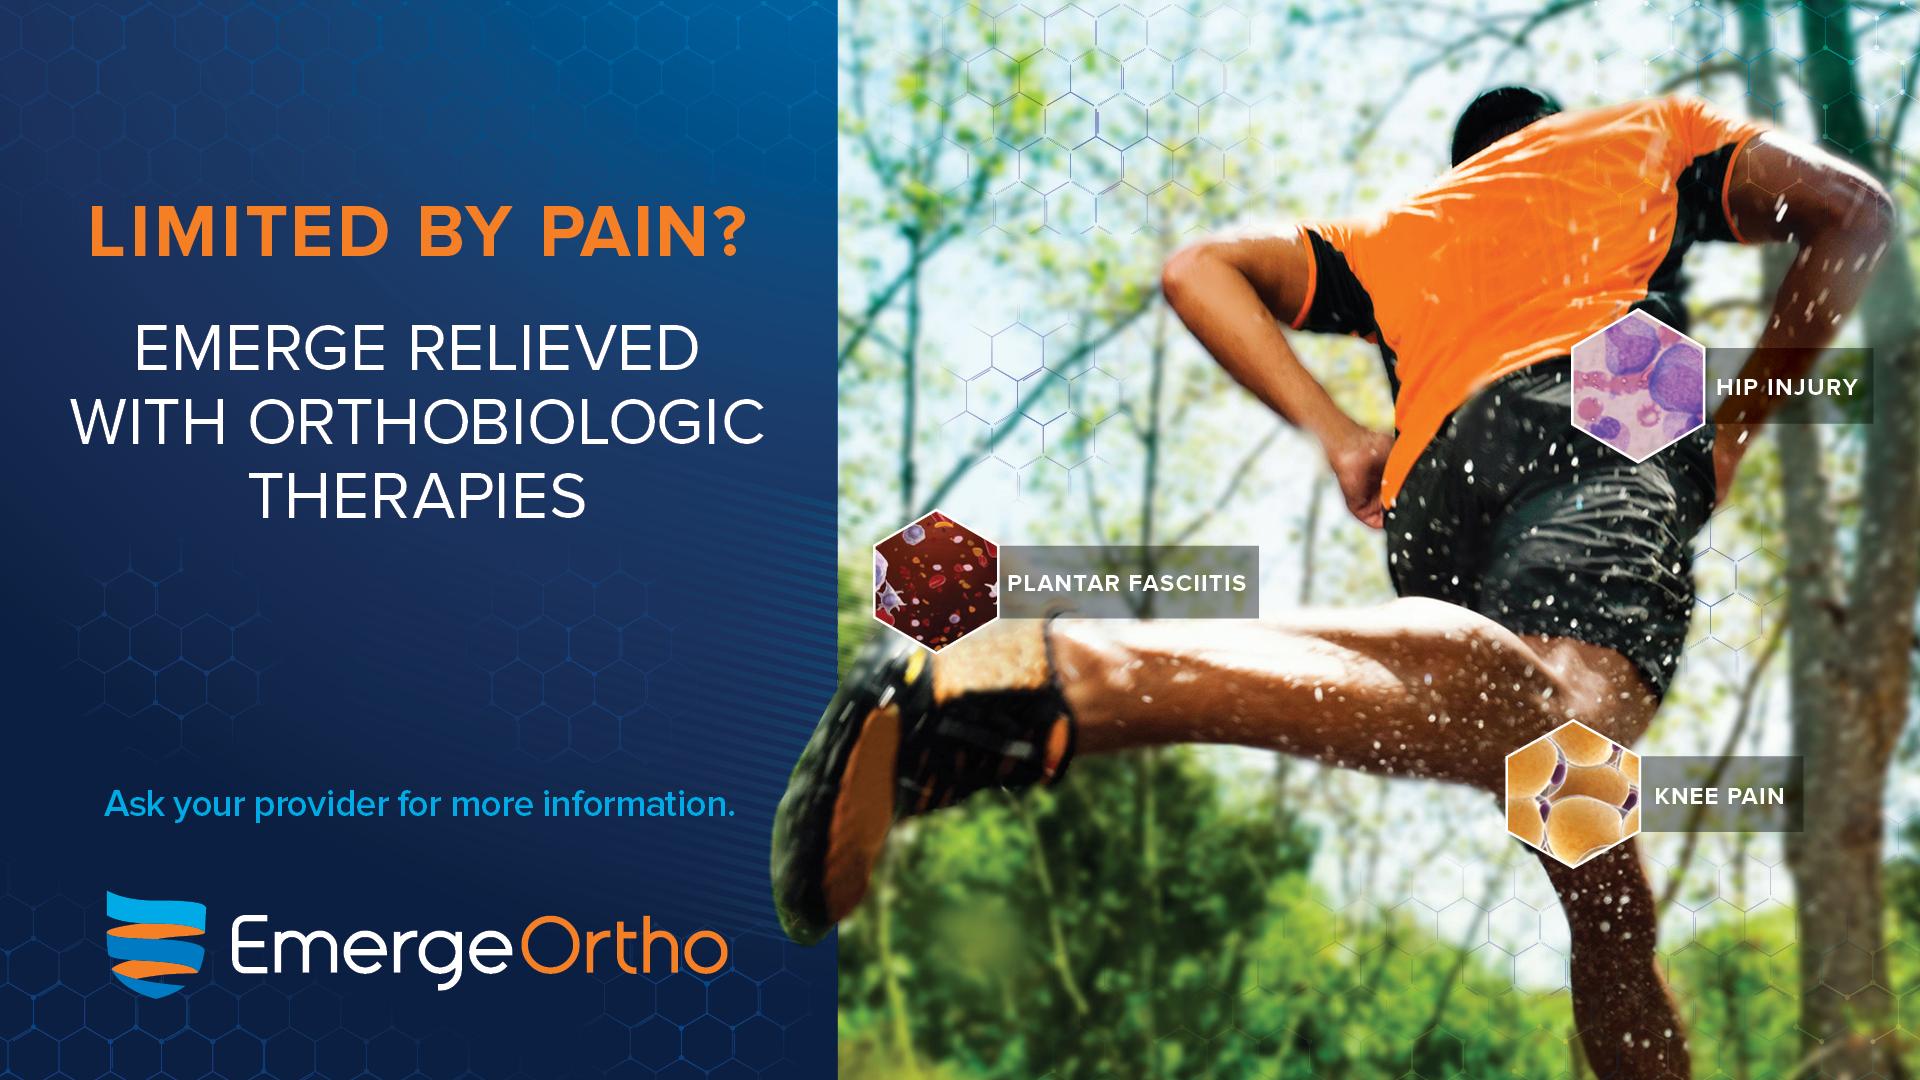 Orthobiologic Treatment Research To Begin In-House » EmergeOrtho